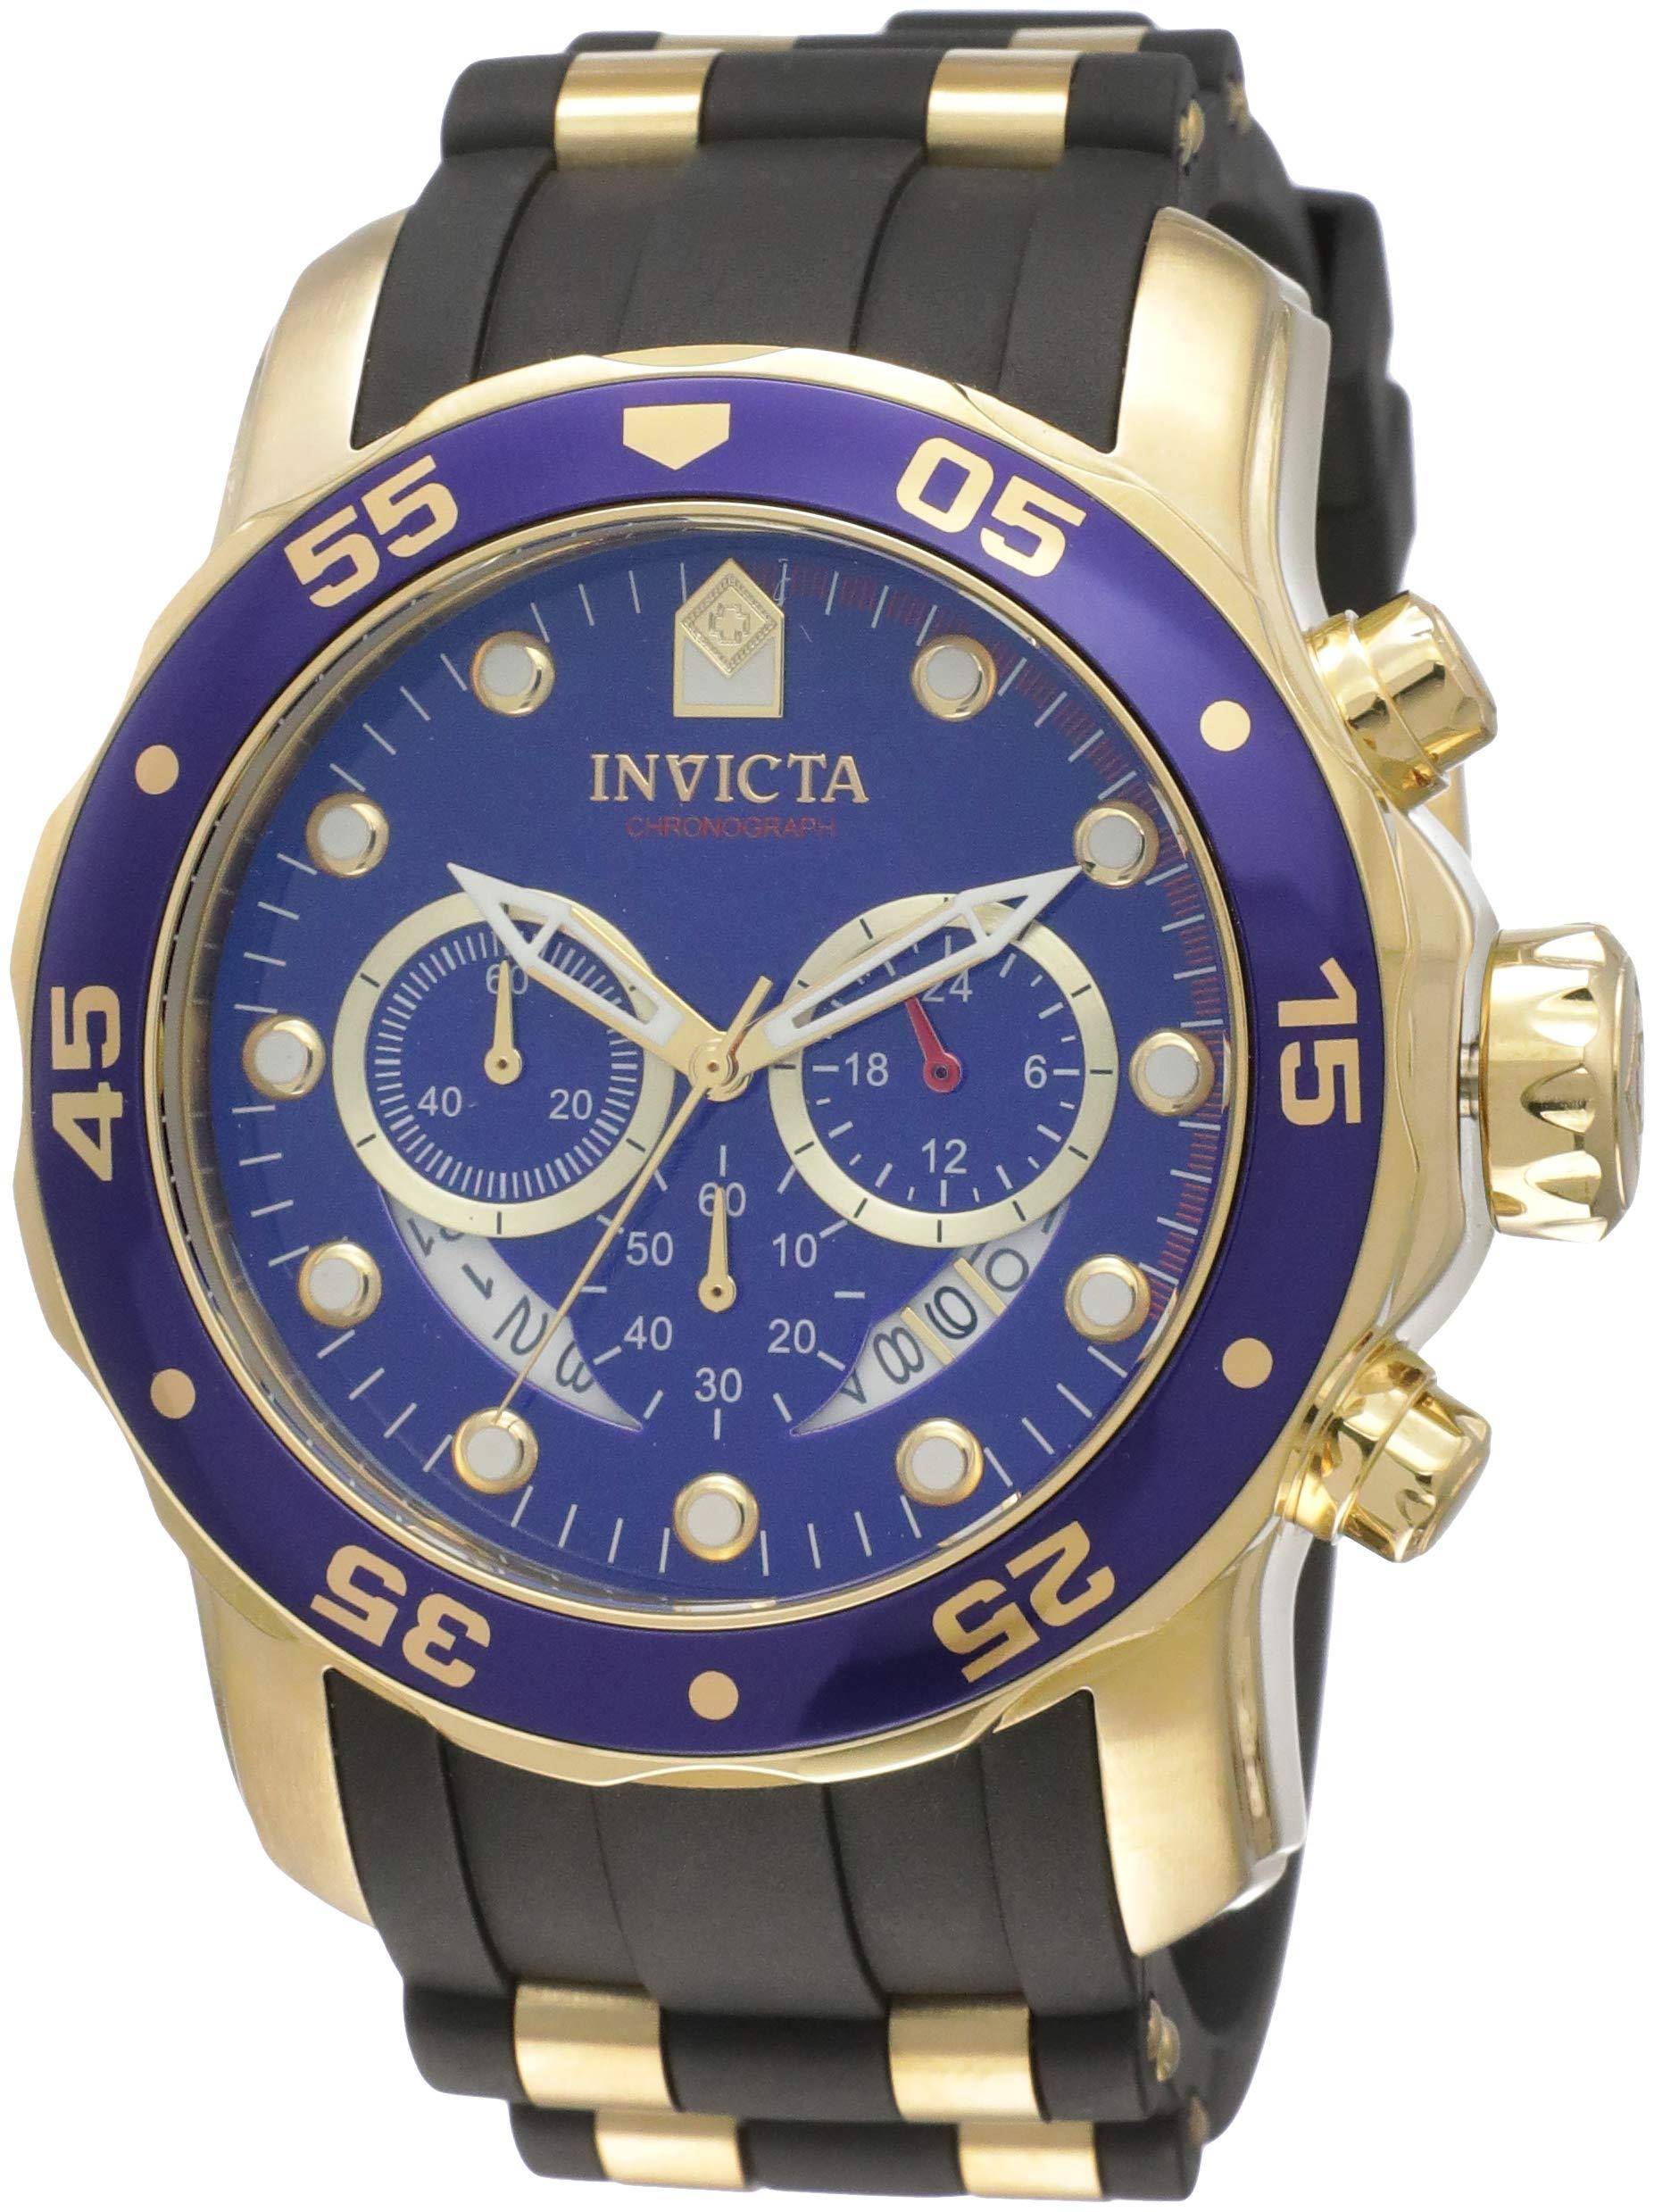 Invicta Men's 6983 Pro Diver Collection Chronograph Blue Dial Black Polyurethane Watch by Invicta